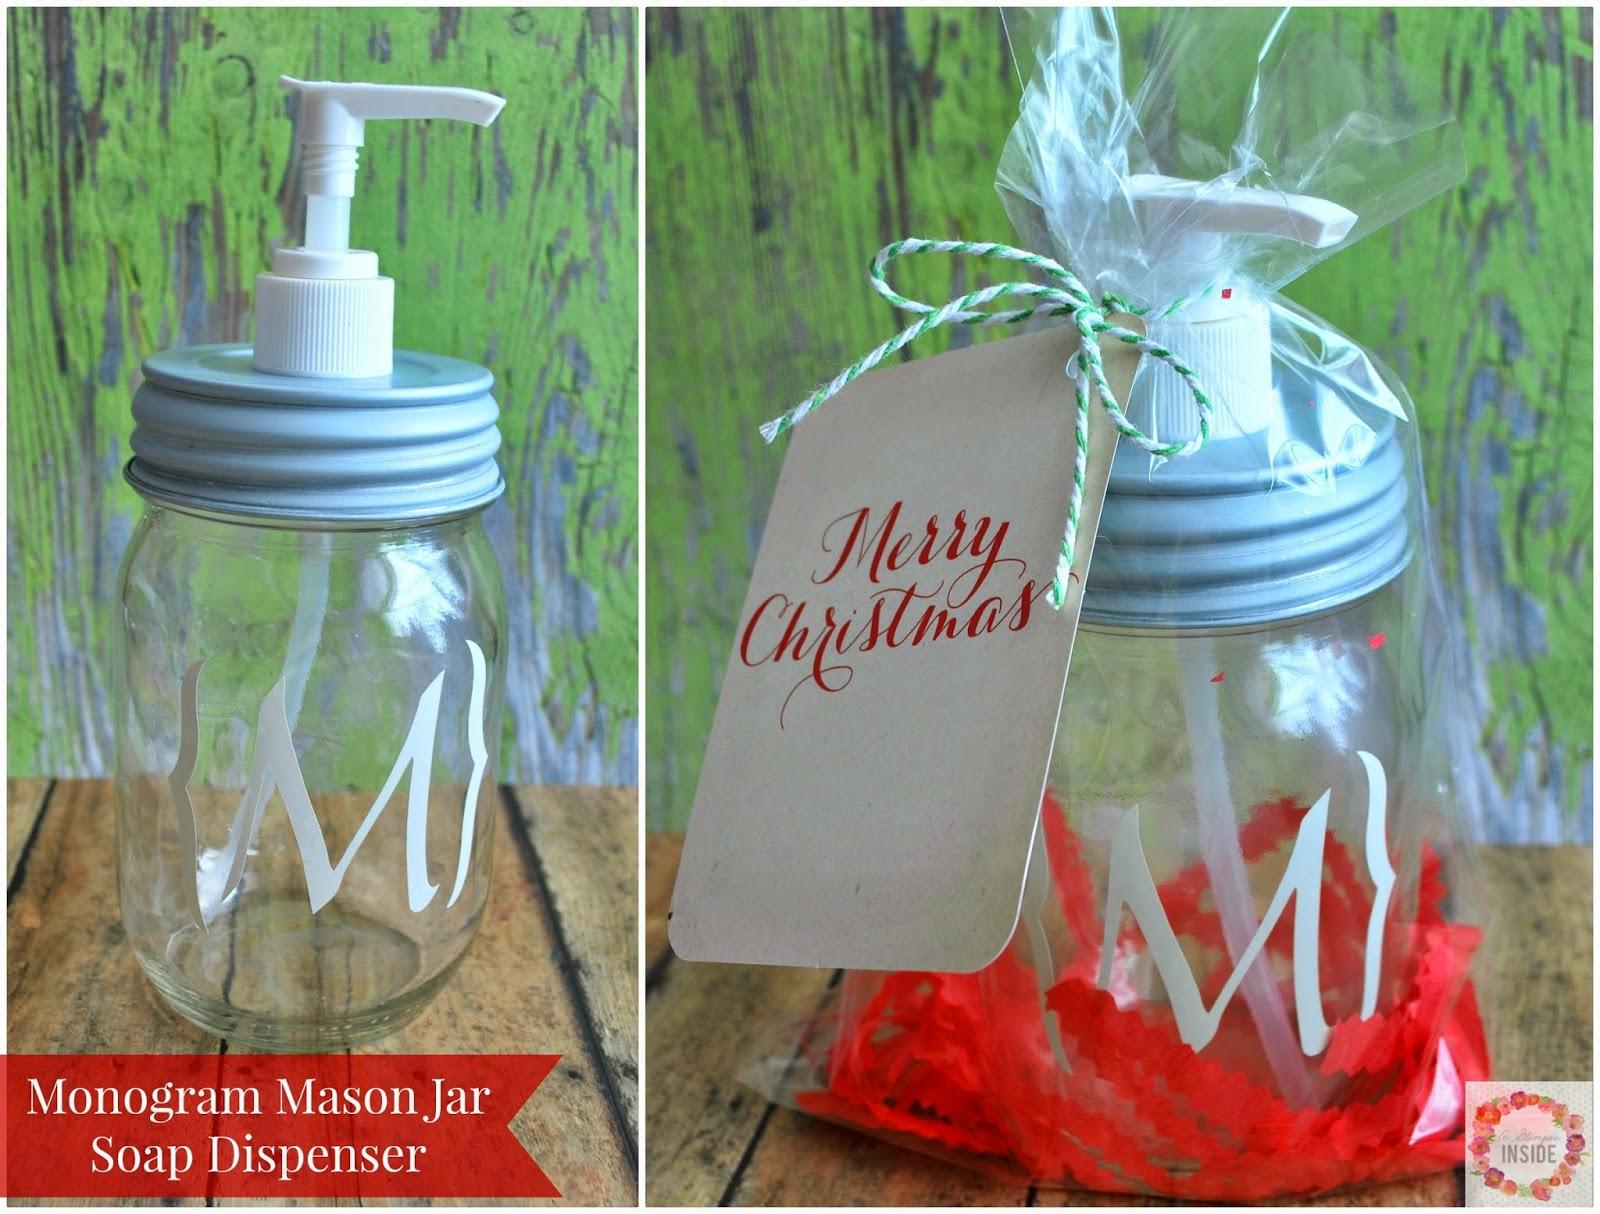 monogram mason jar soap dispenser easy gift idea a glimpse inside